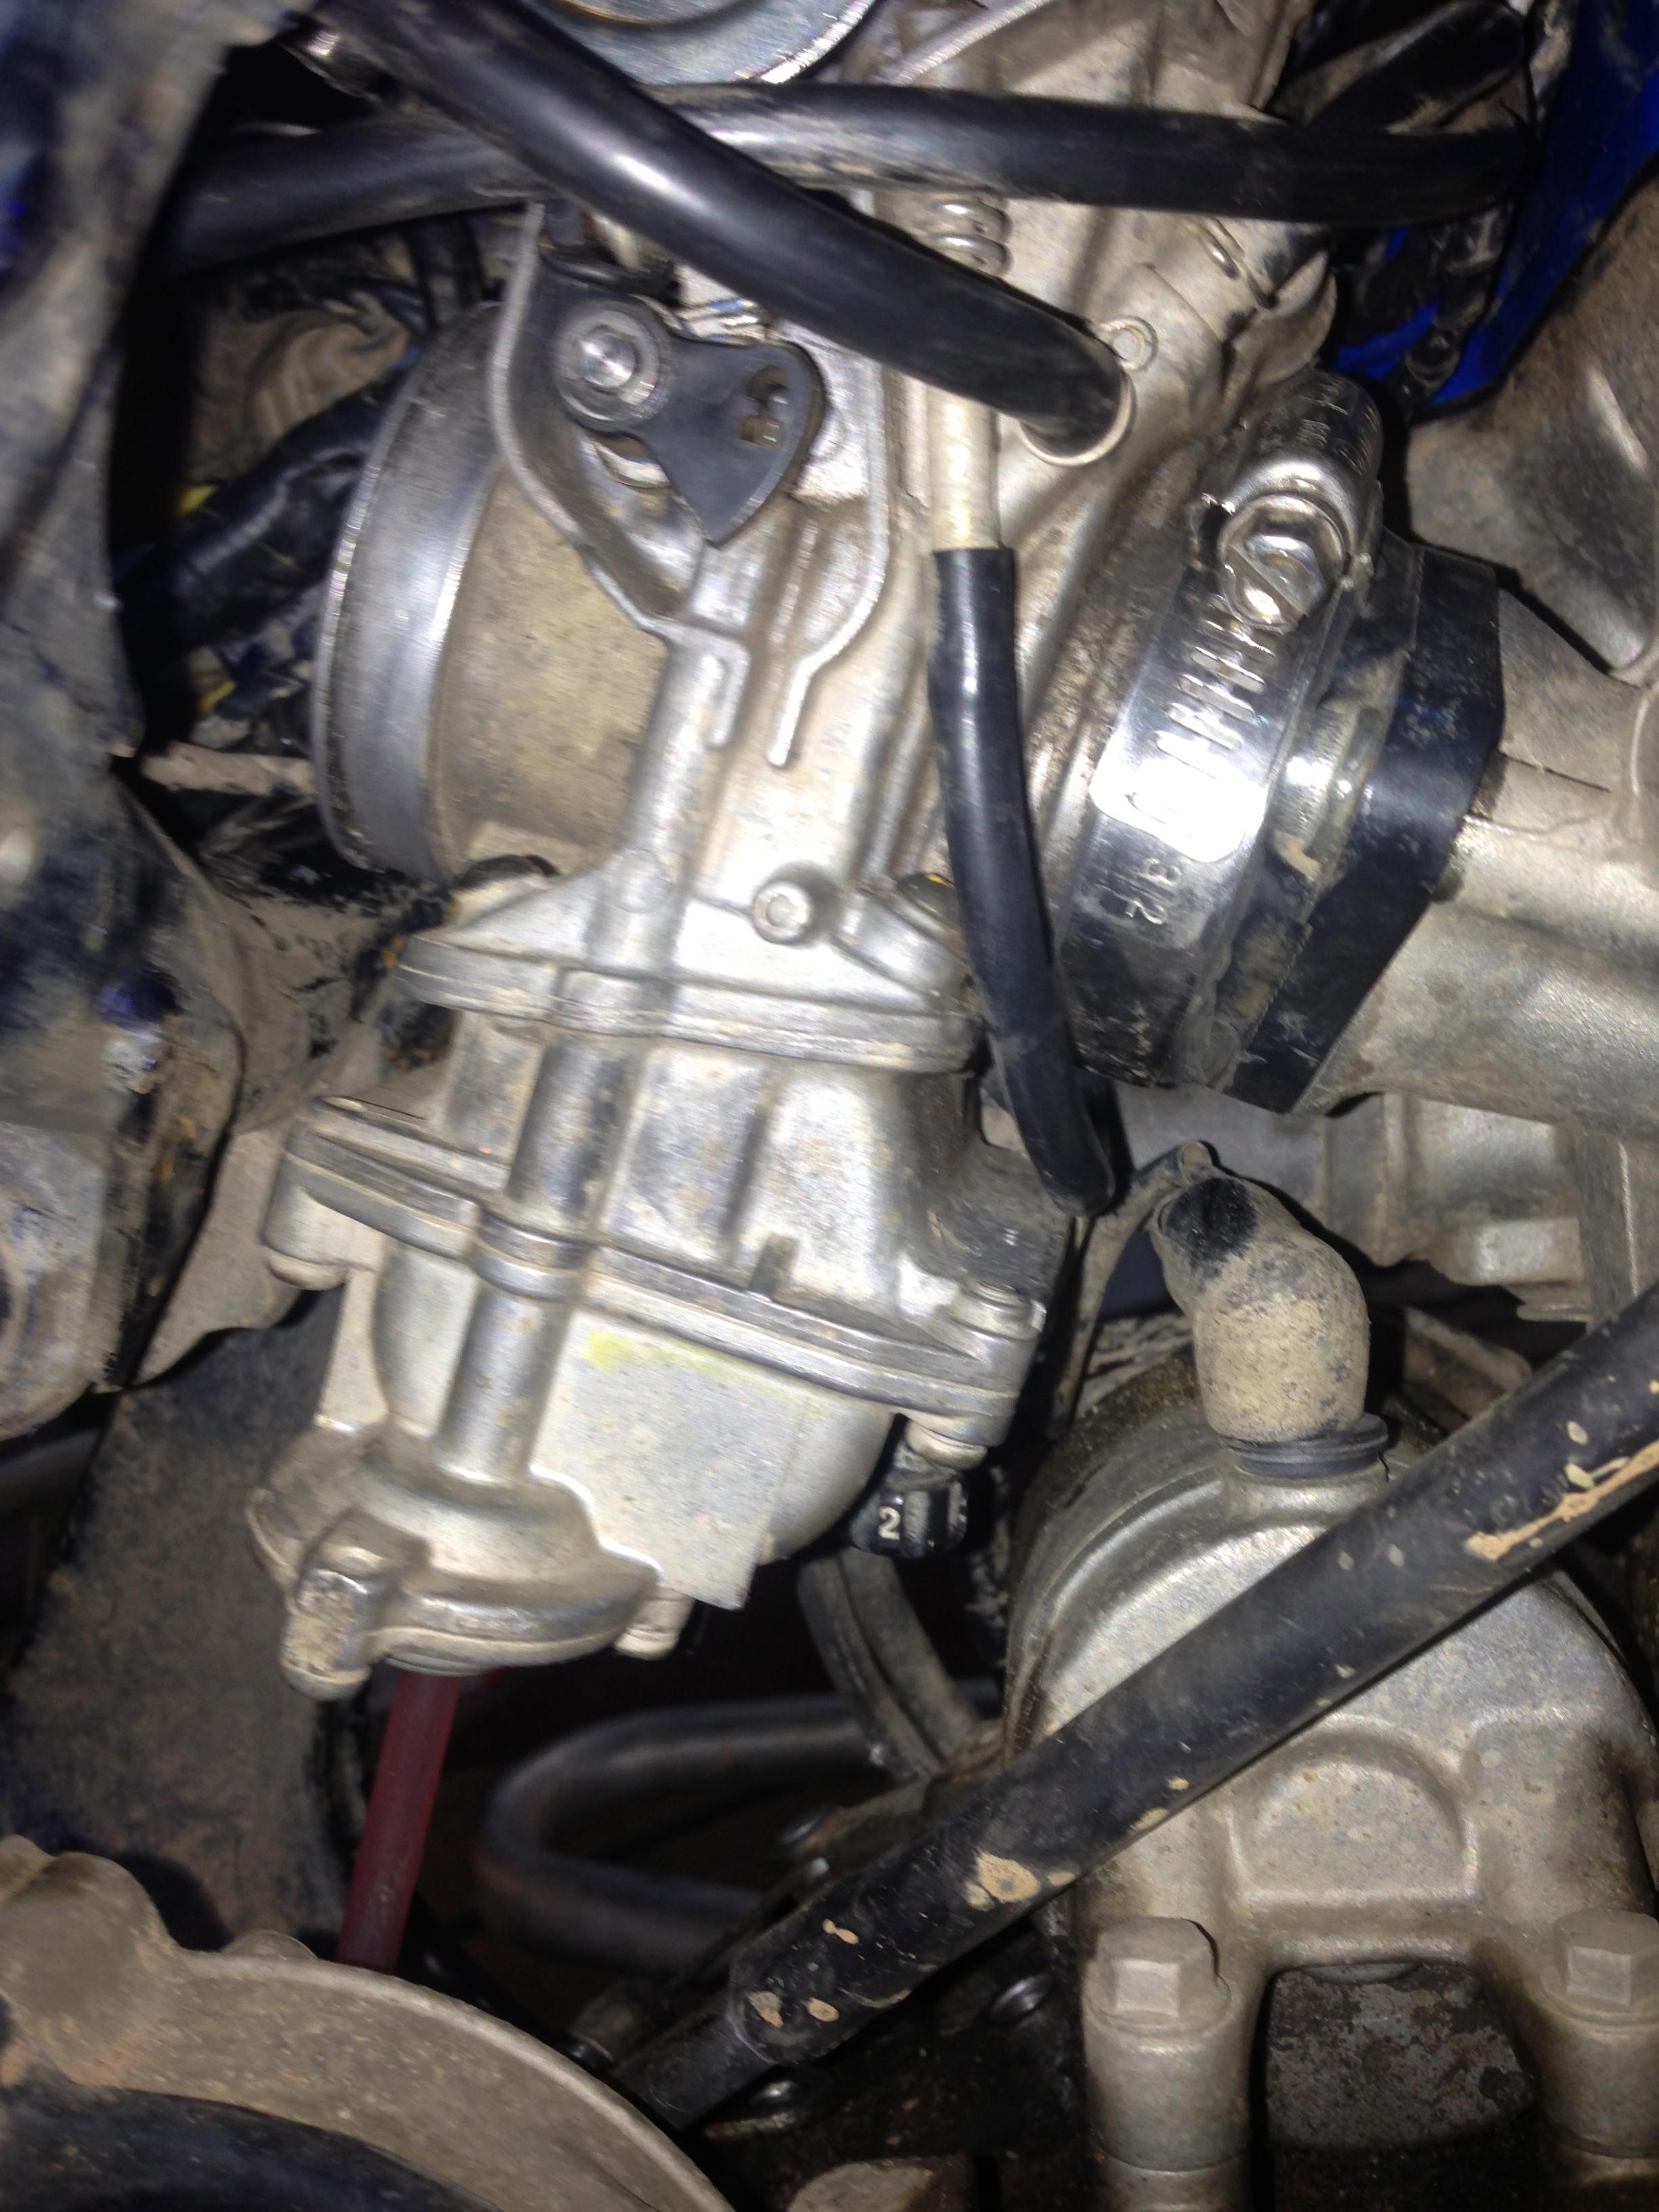 Carb swap guide - Suzuki LT-R450 Forum :: LTR450HQ com